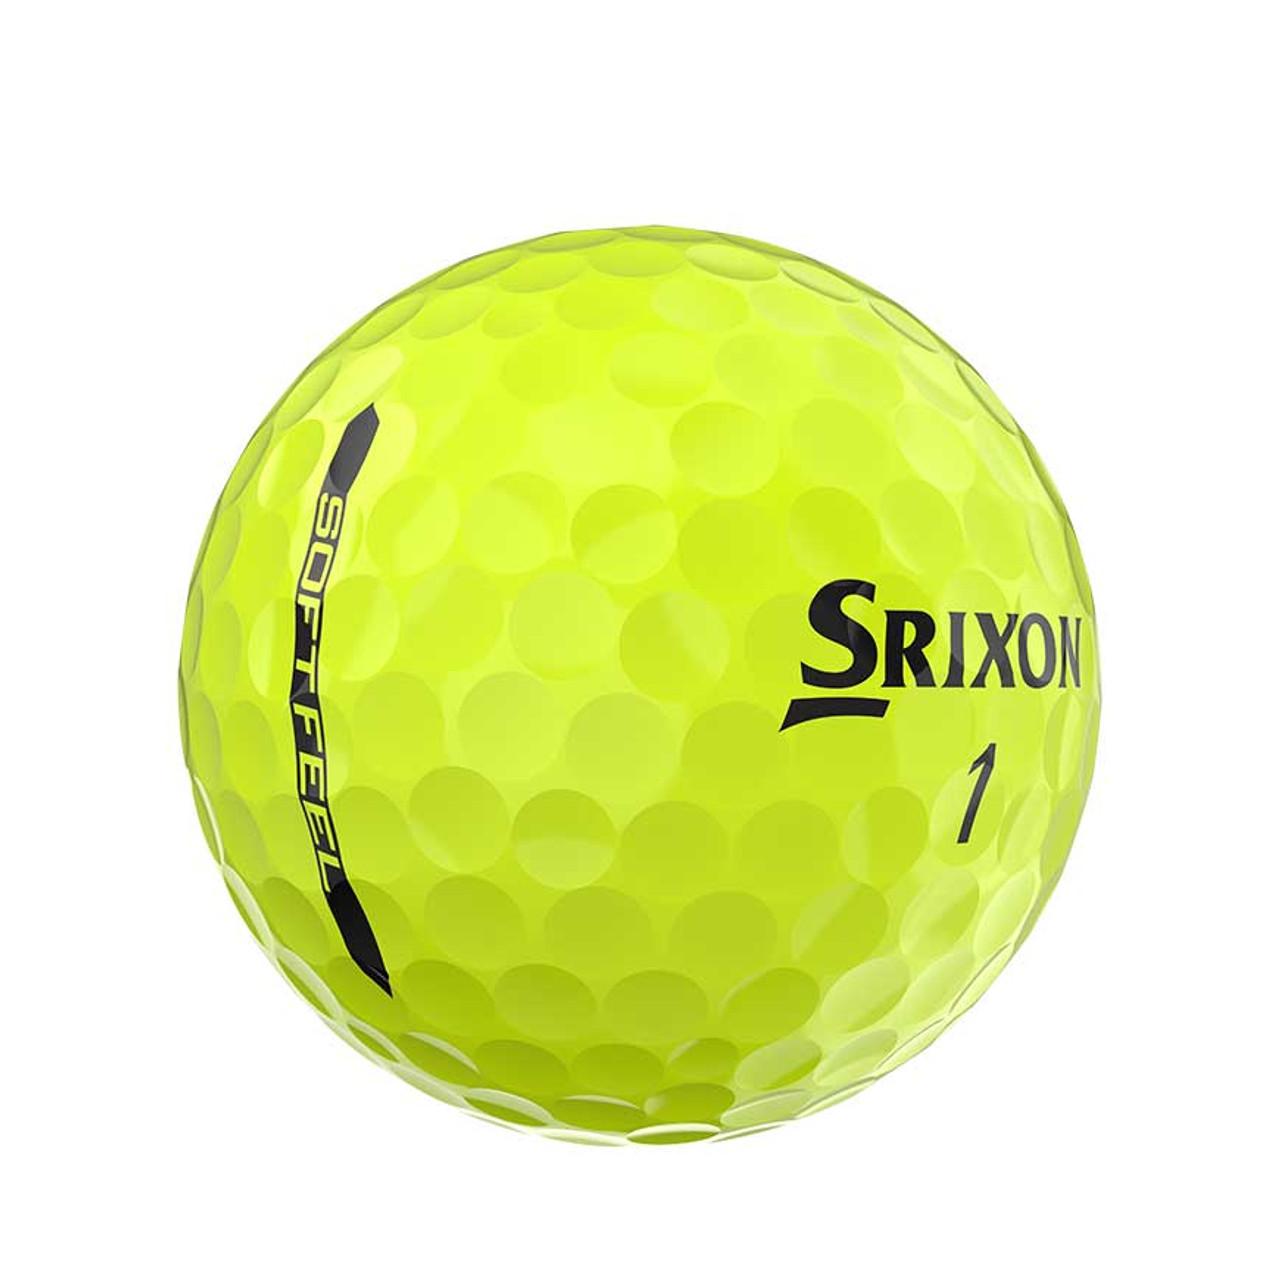 Srixon Soft Feel 12 Dozen Golf Balls - Yellow